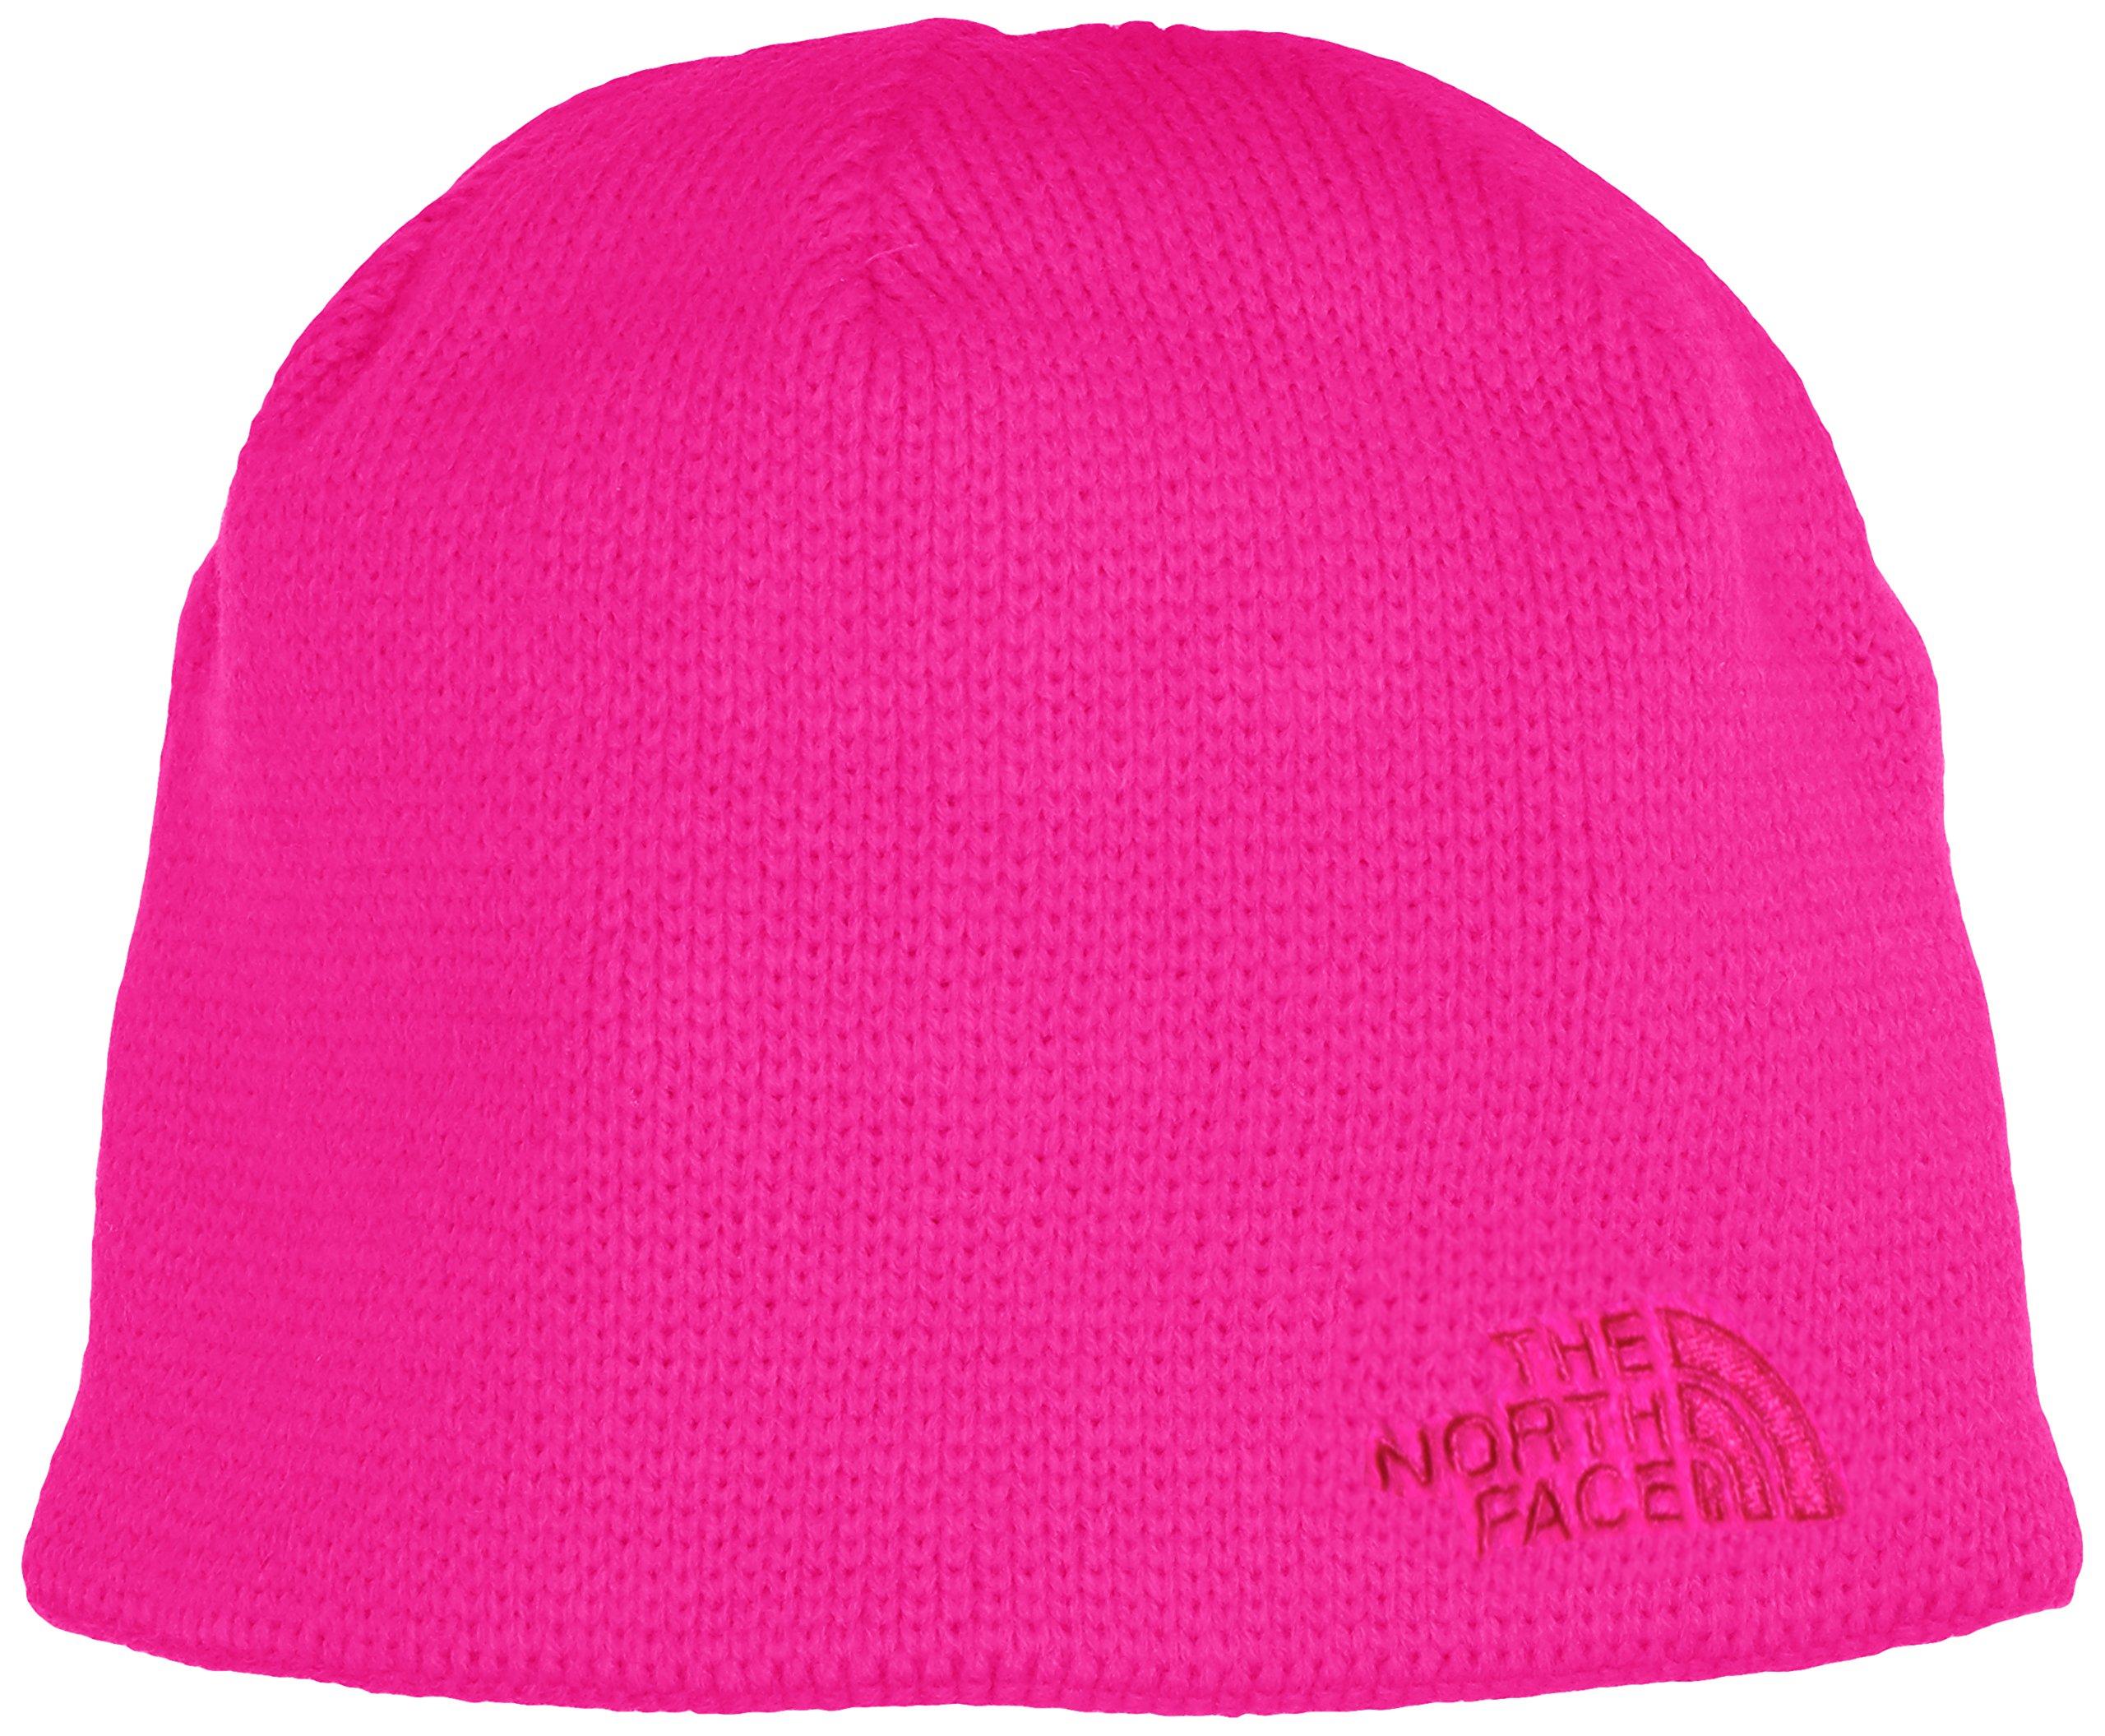 The North Face Women's Bones Beanie, Luminous Pink One Size